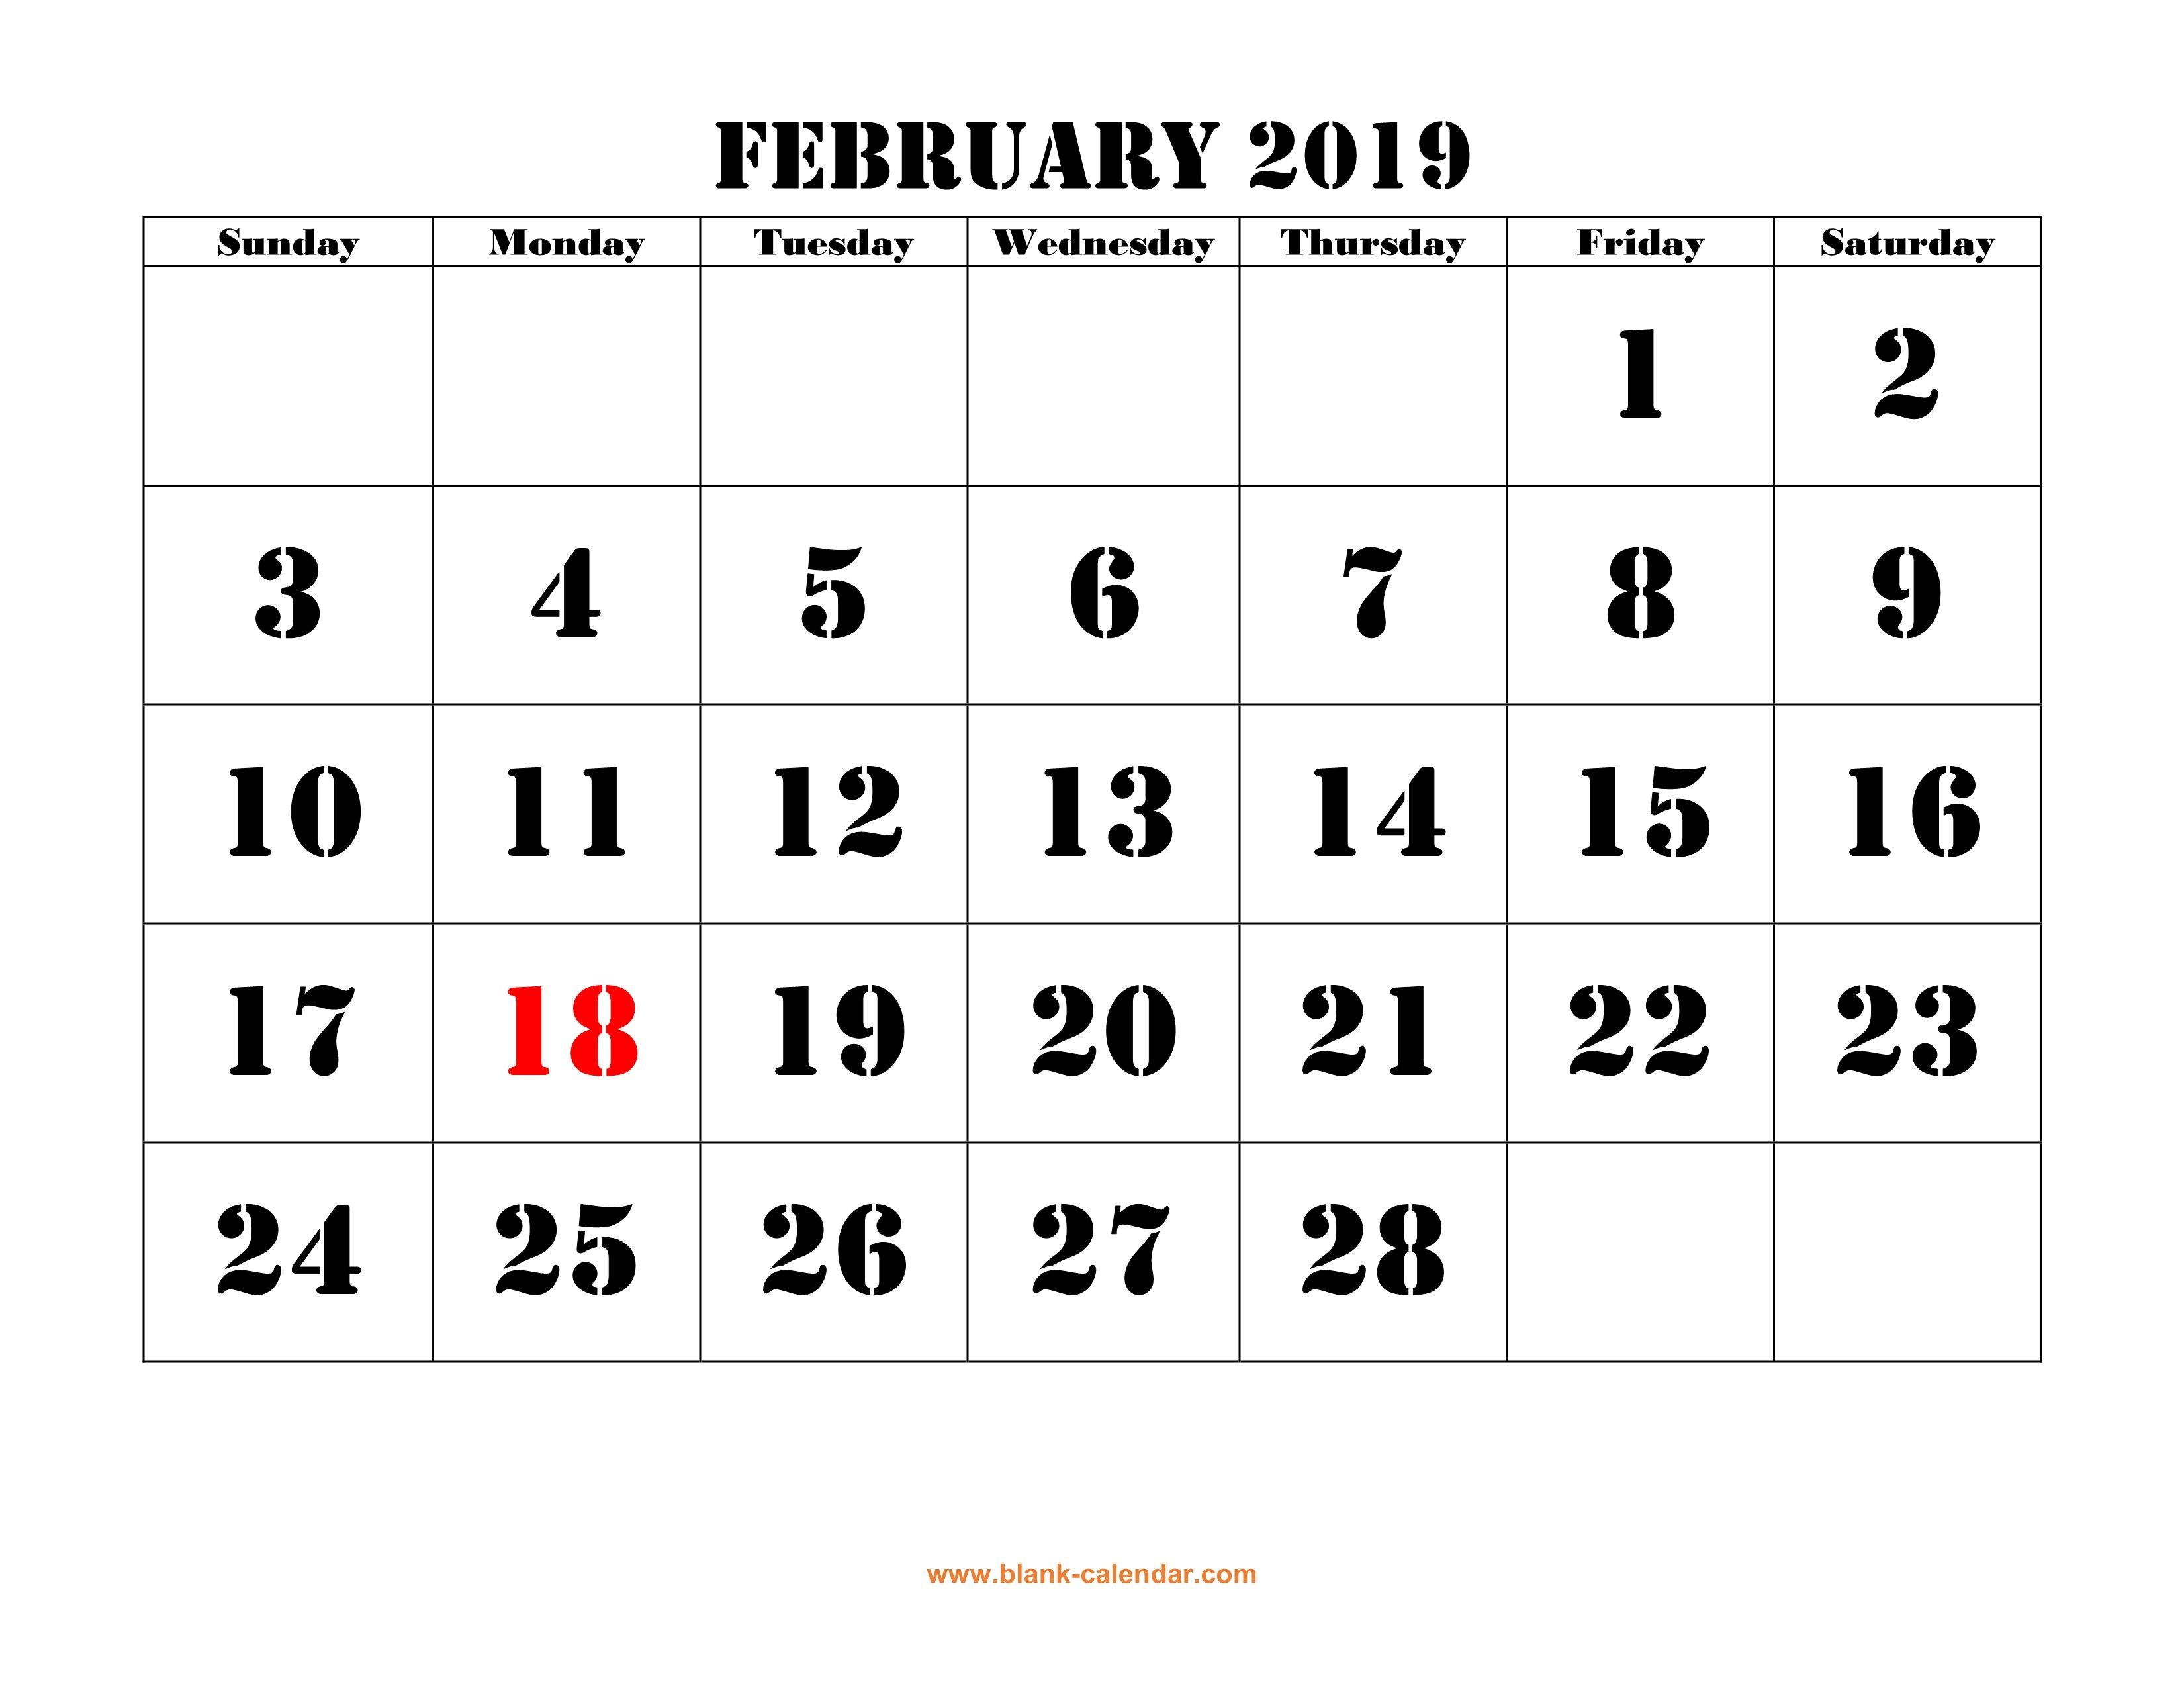 February 2019 Printable Calendar | Free Download Monthly Calendar Calendar 2019 Large Printable